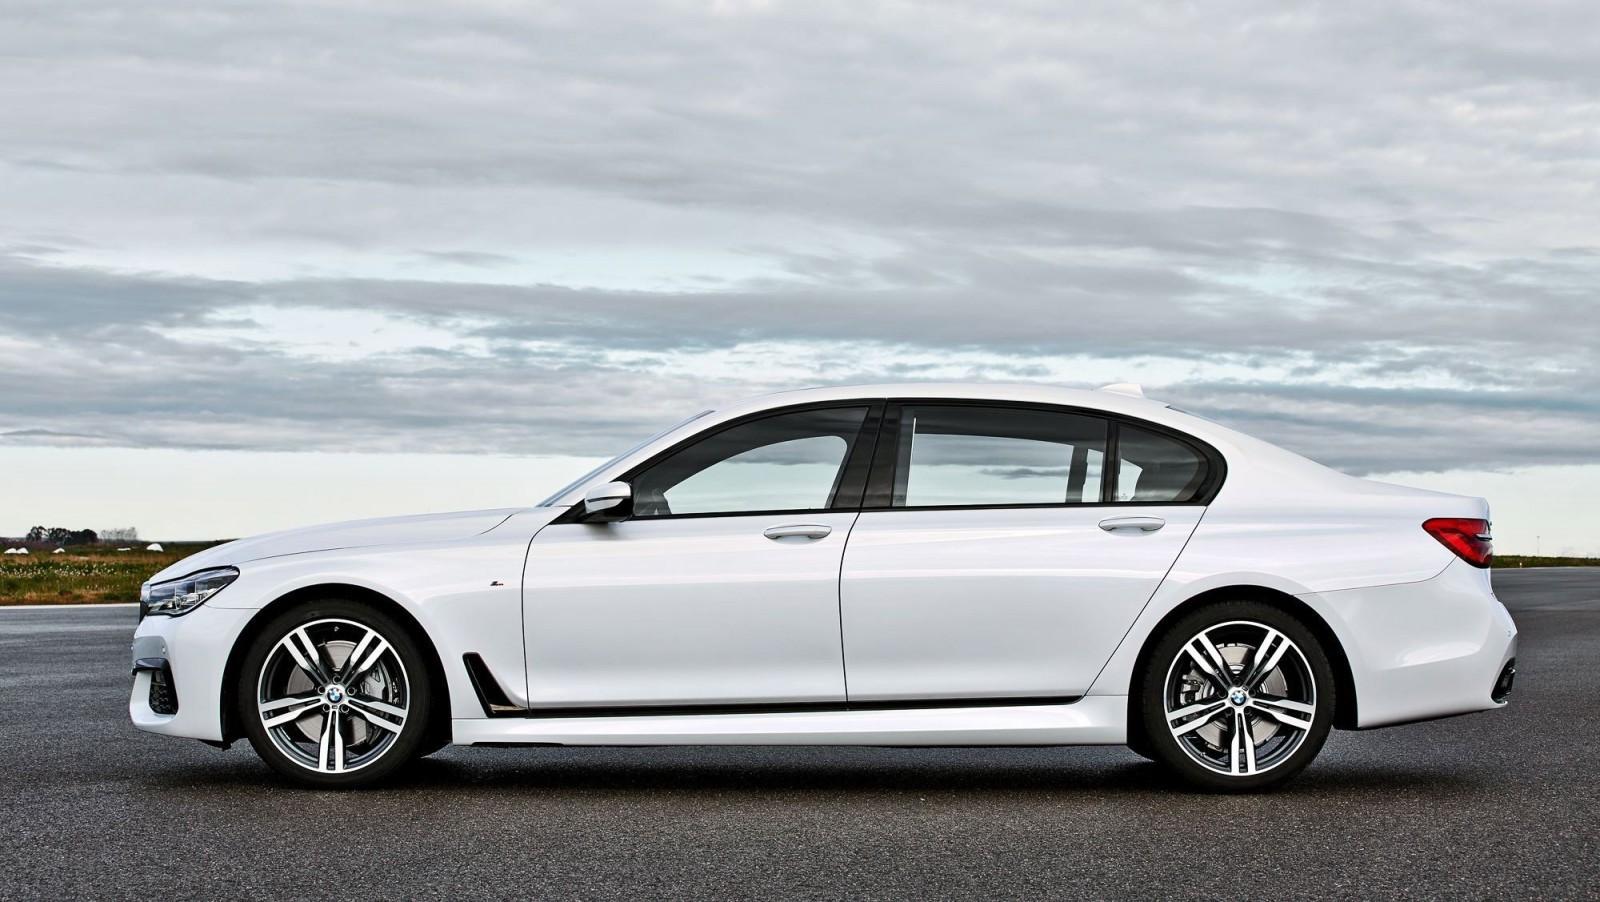 2016 BMW 750 Exterior Photos 38